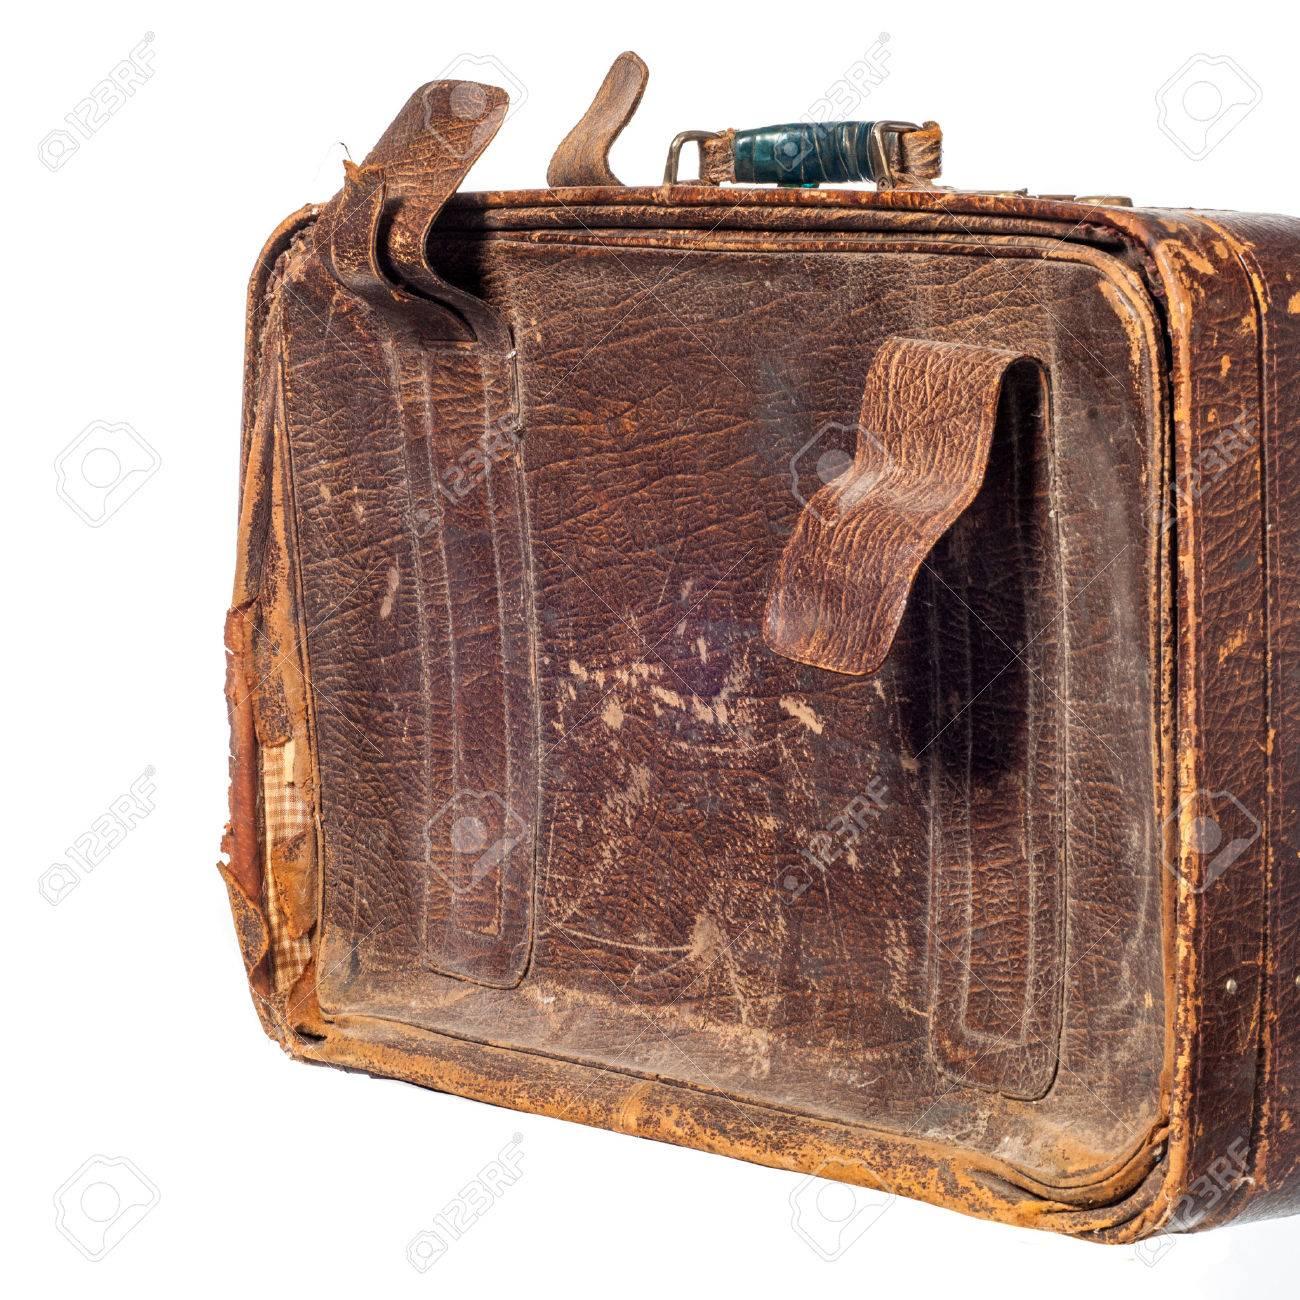 old suitcase texture suitcase bag trunk case handbag stock